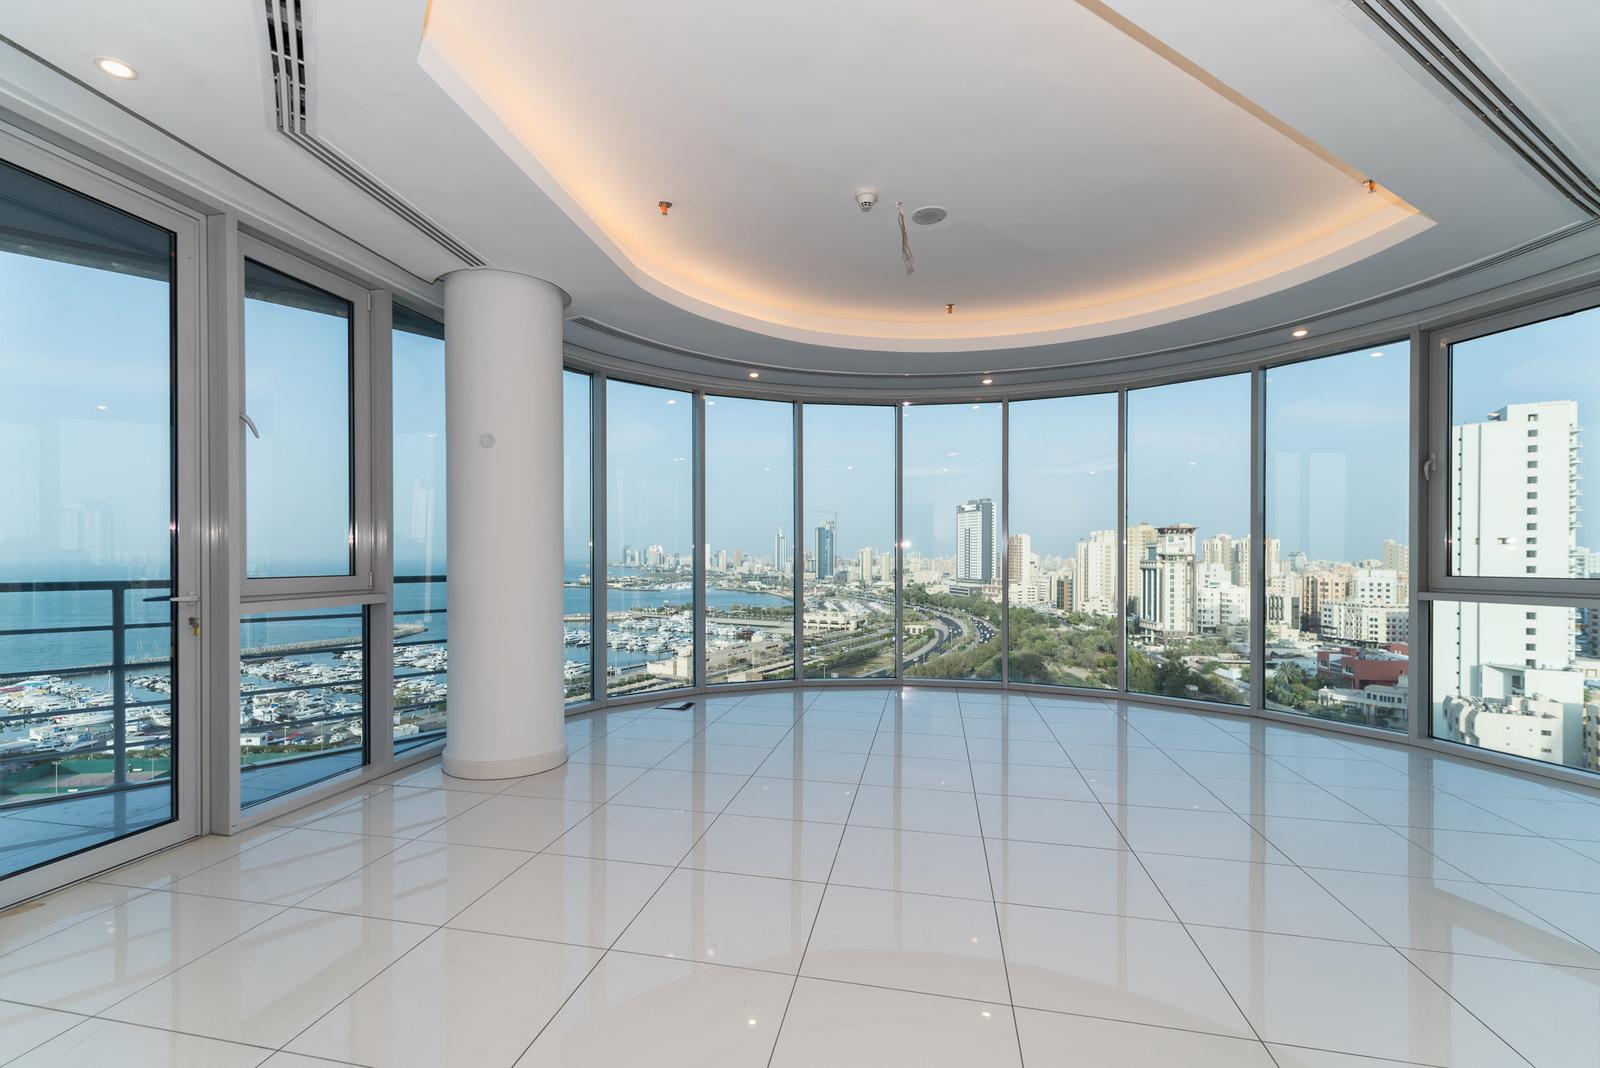 Salmiya – unfurnished, three bedroom apartments w/panoramic views